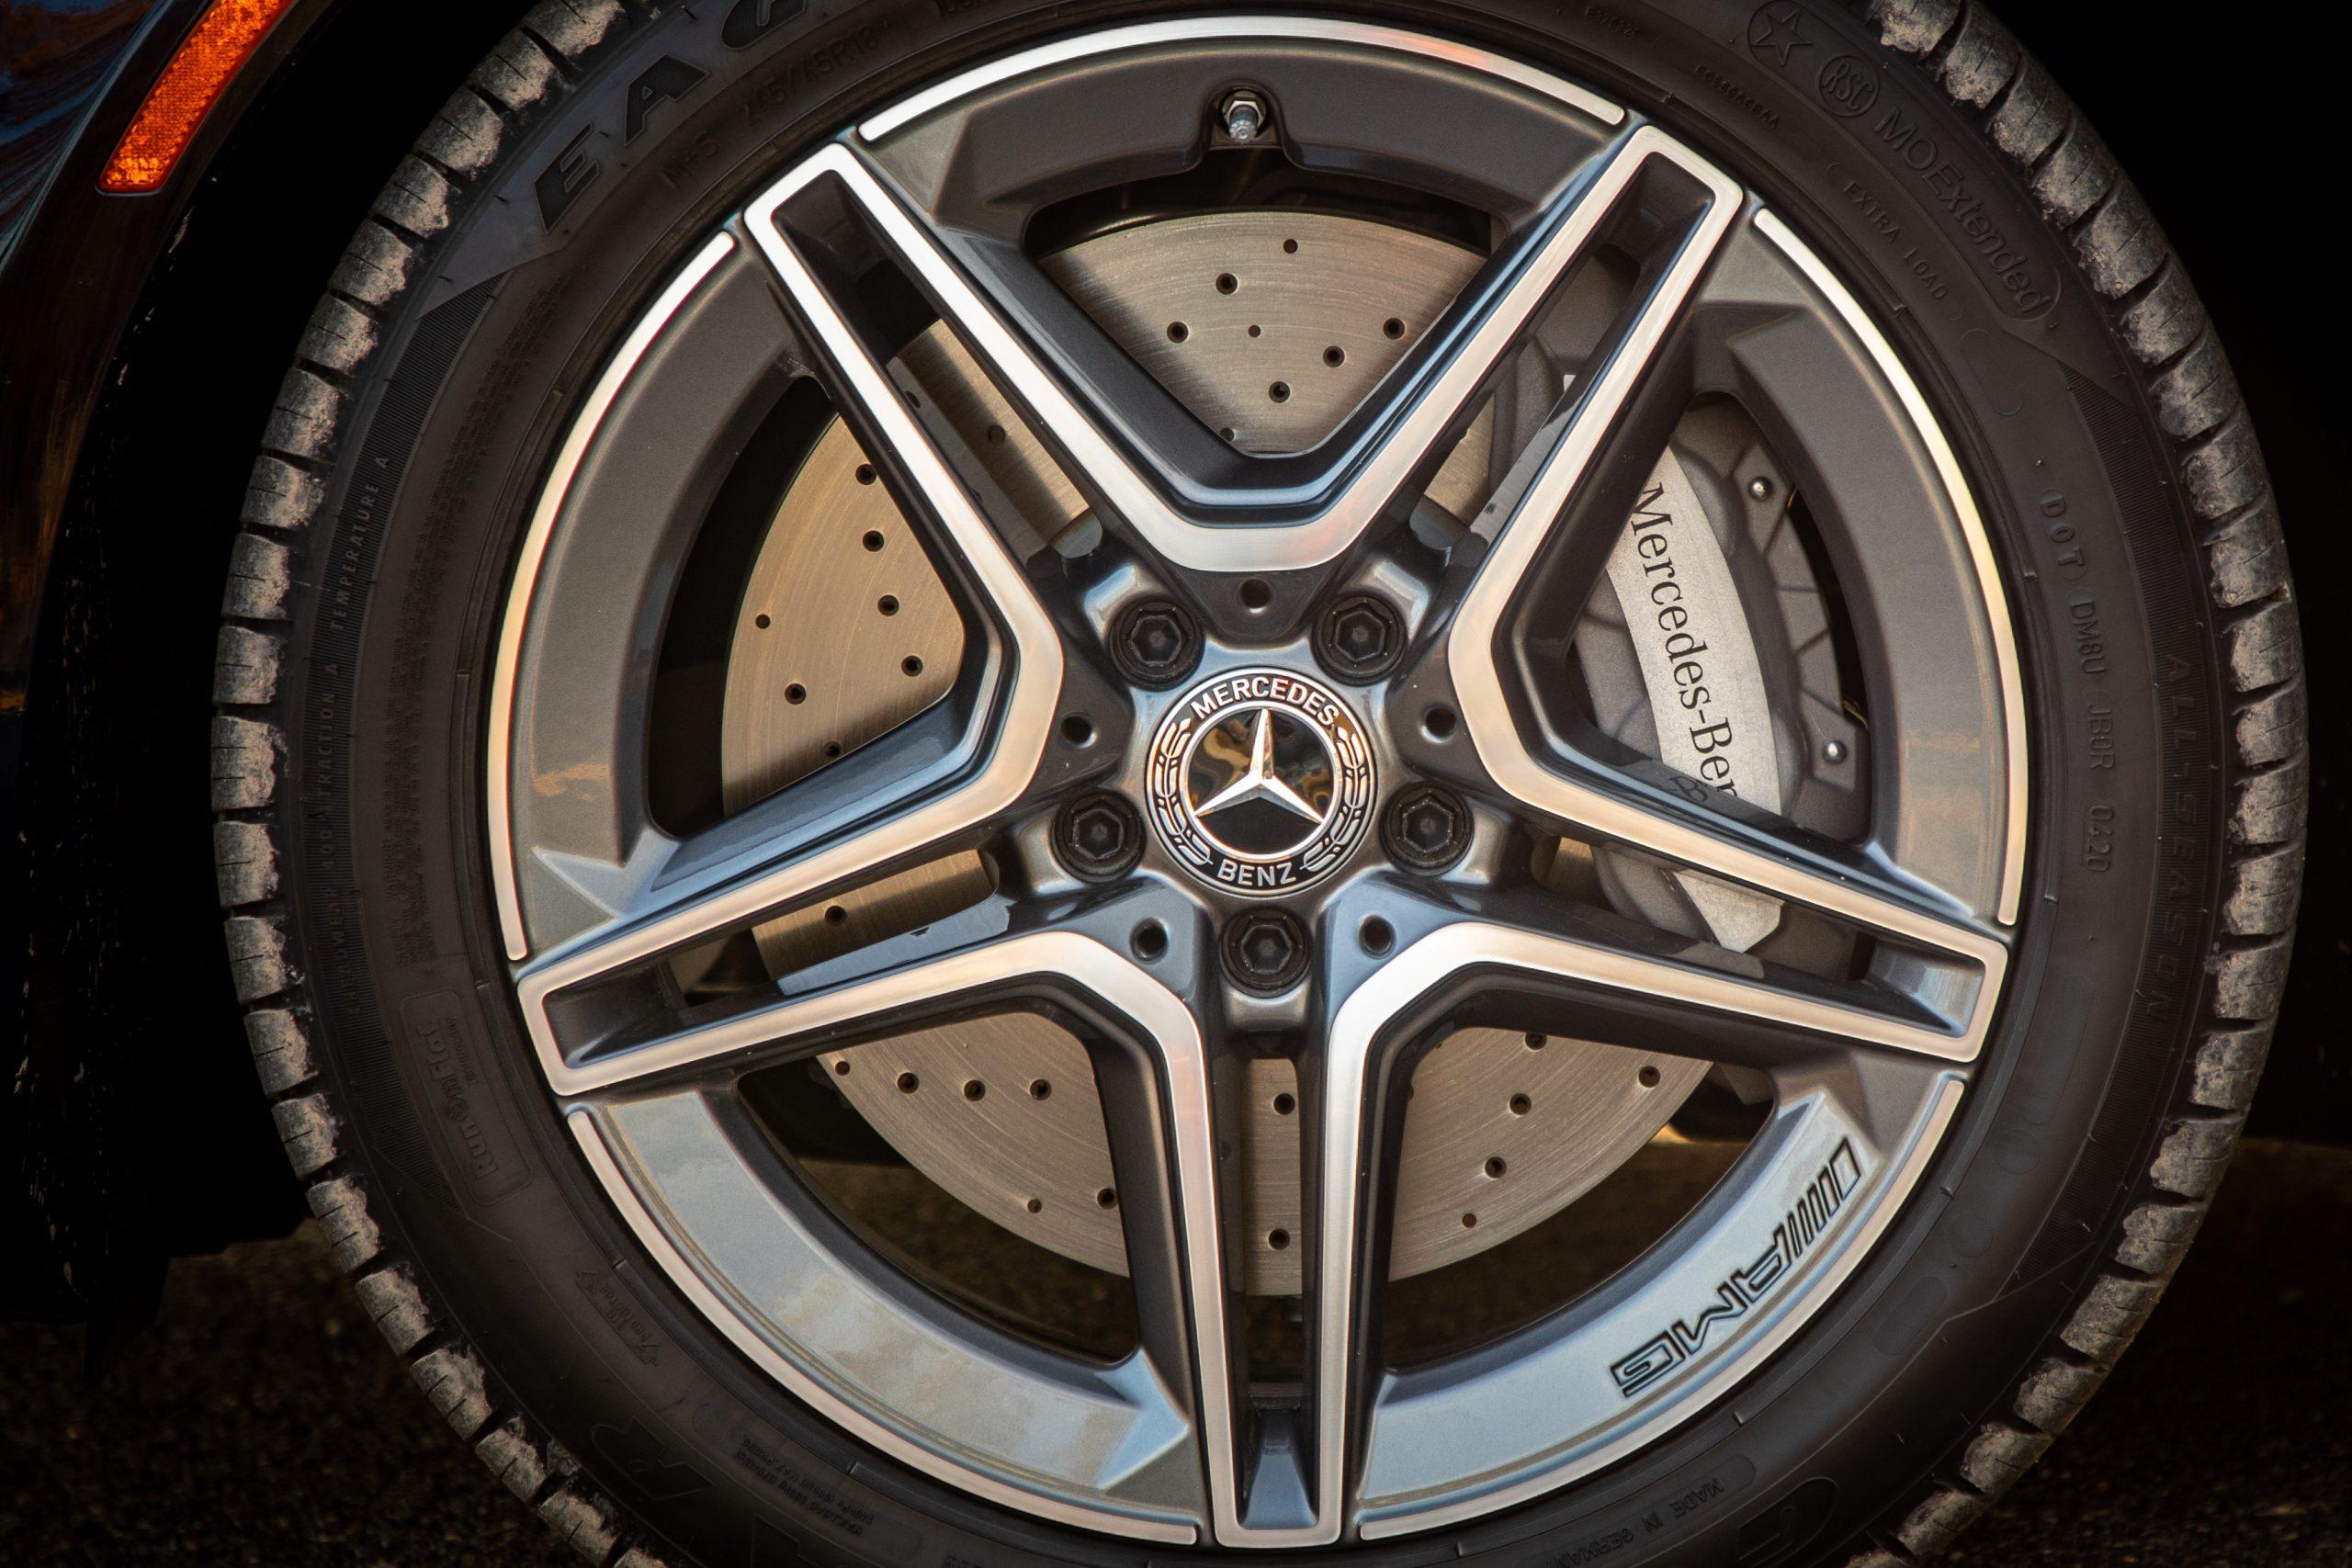 2021 Mercedes Benz E 450 4MATIC wheel brake detail